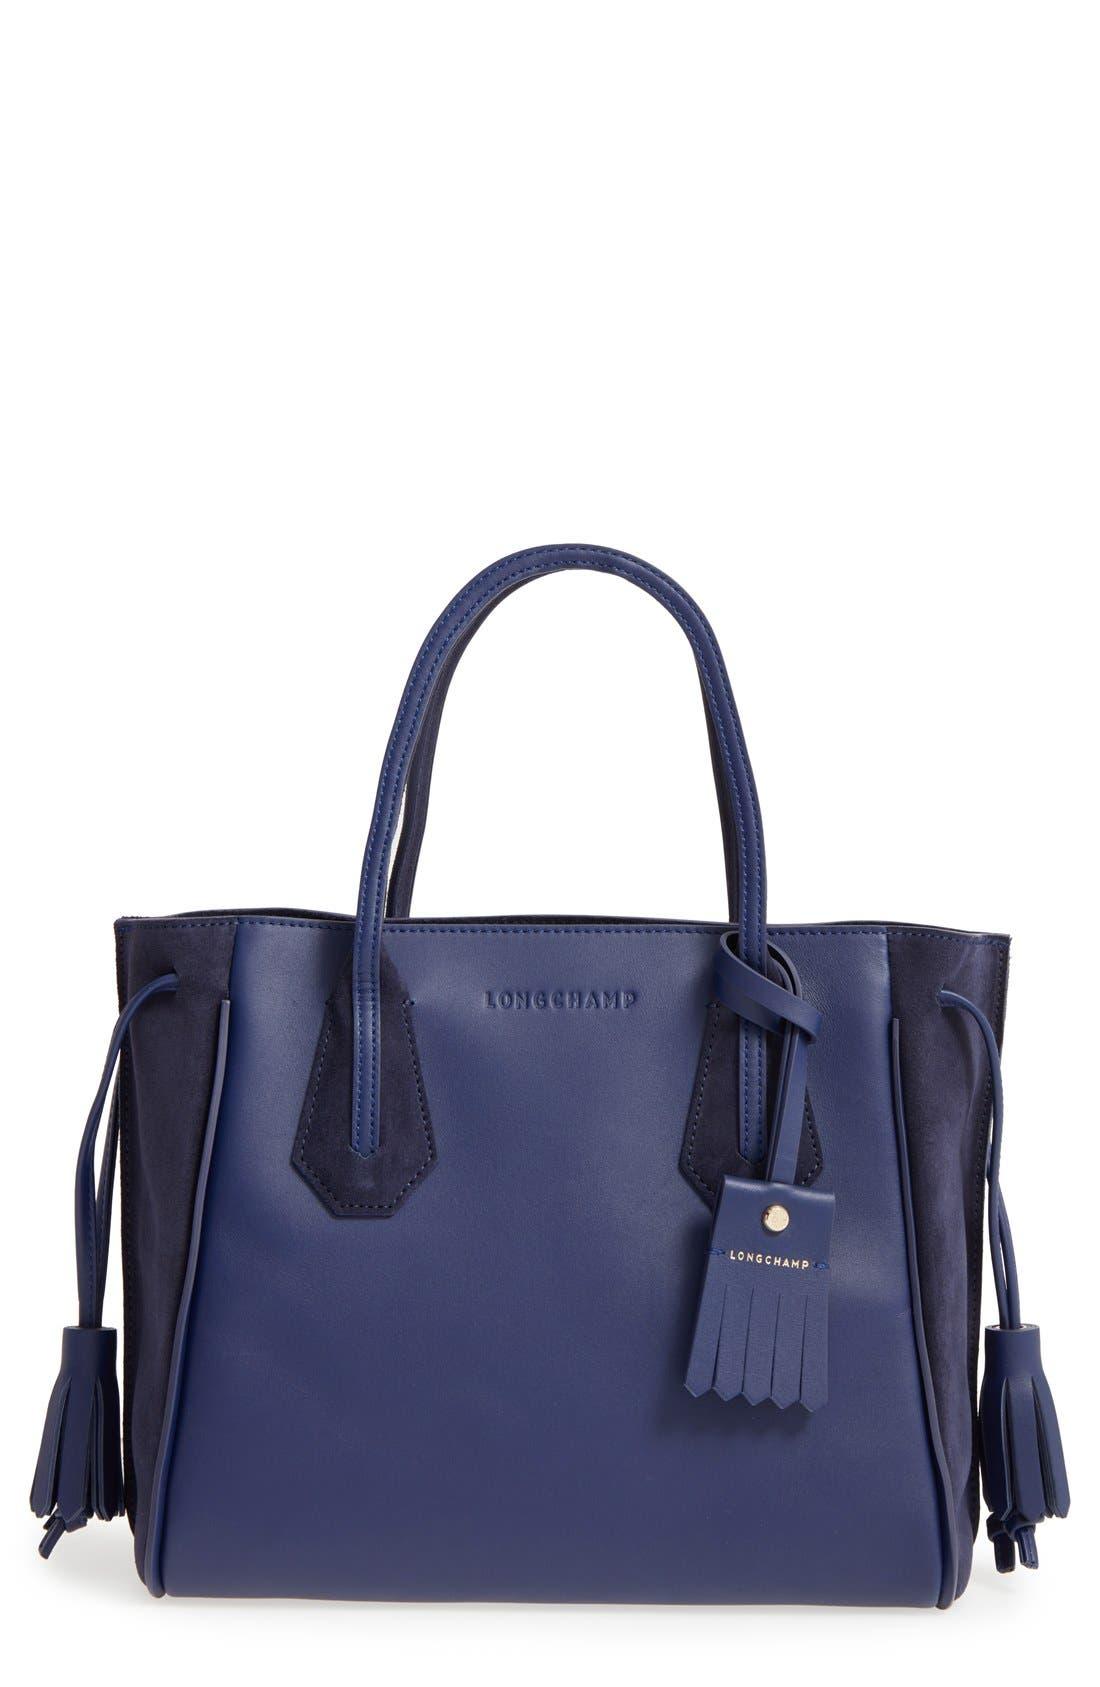 Longchamp 'Small Penelope Fantasie' Leather Tote